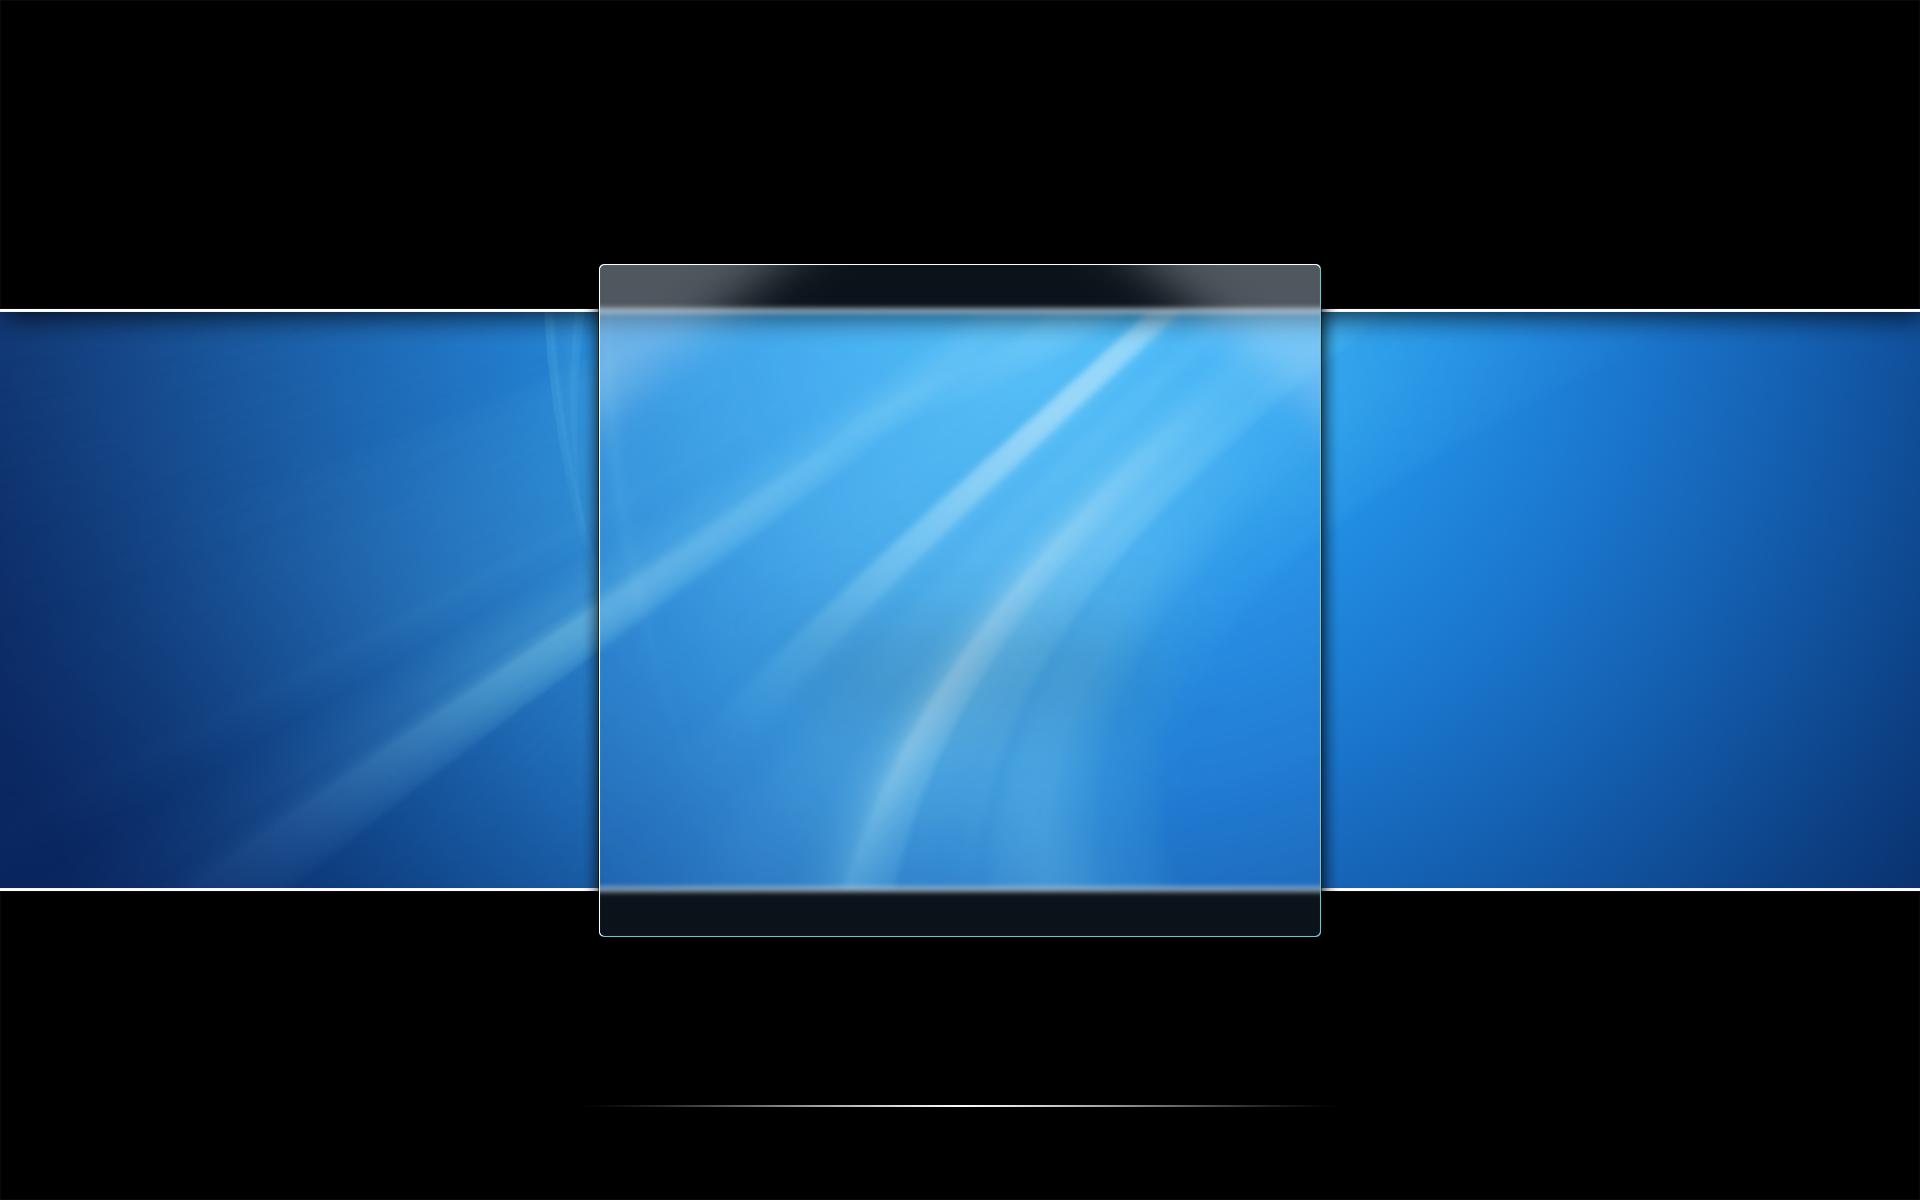 wallpaper screensavers logon 119752